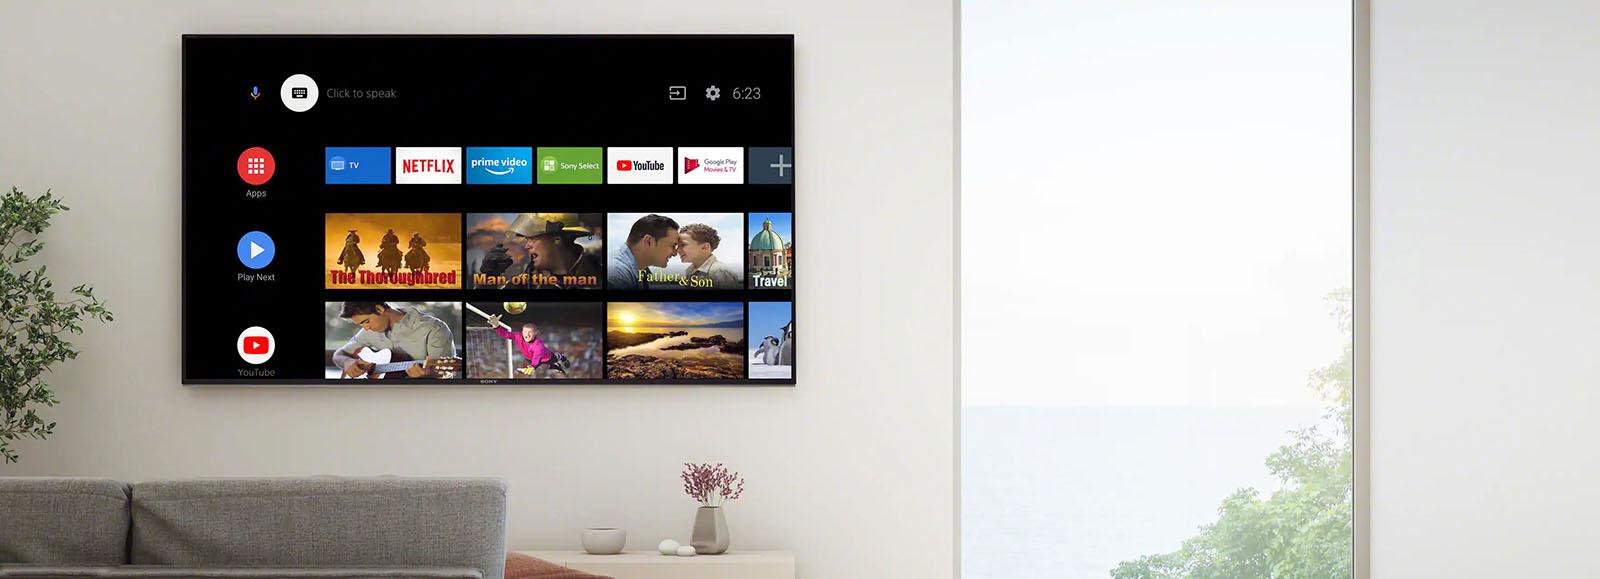 تلویزیون هوشمند سونی 85X8000H محصول 2020